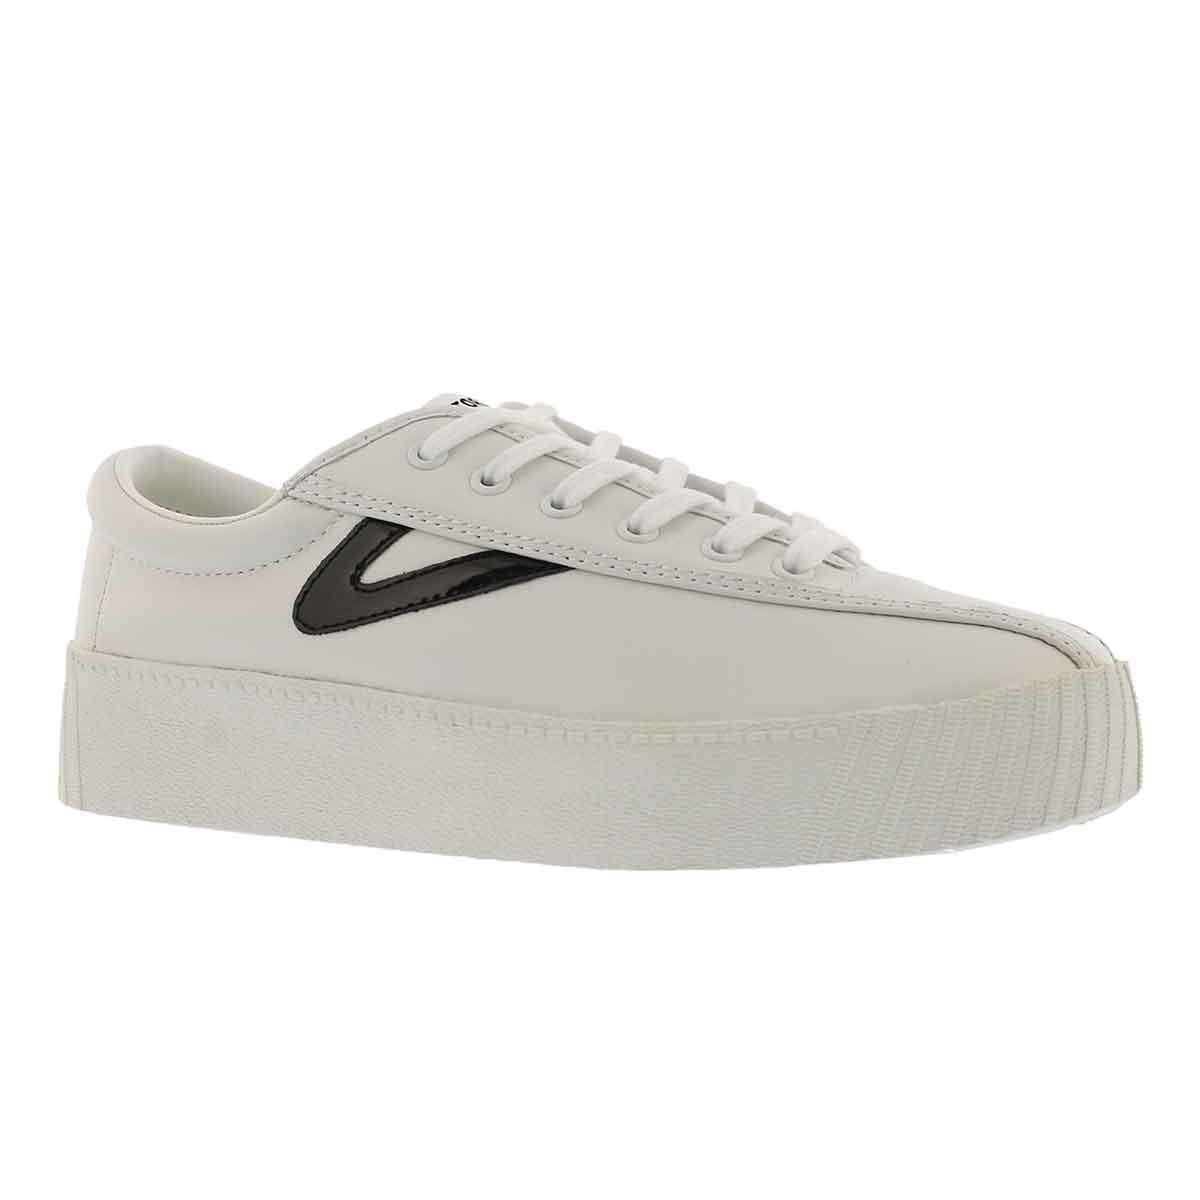 Women's NYLITE 2 BOLD white/black sneakers